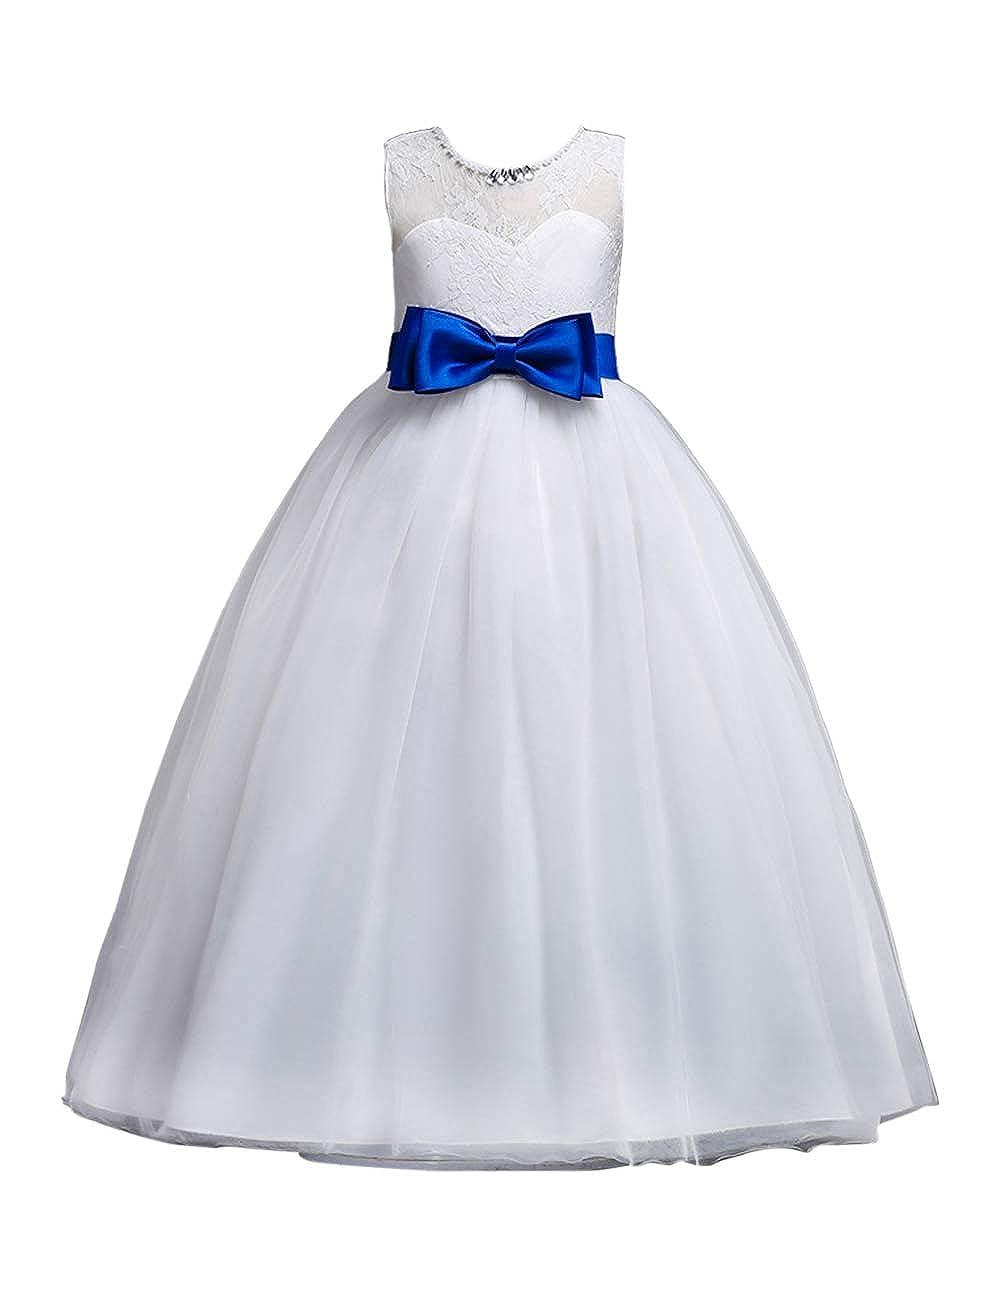 Girls Flower Chiffon Dress Bridesmaid Party Princess Prom Wedding Christening